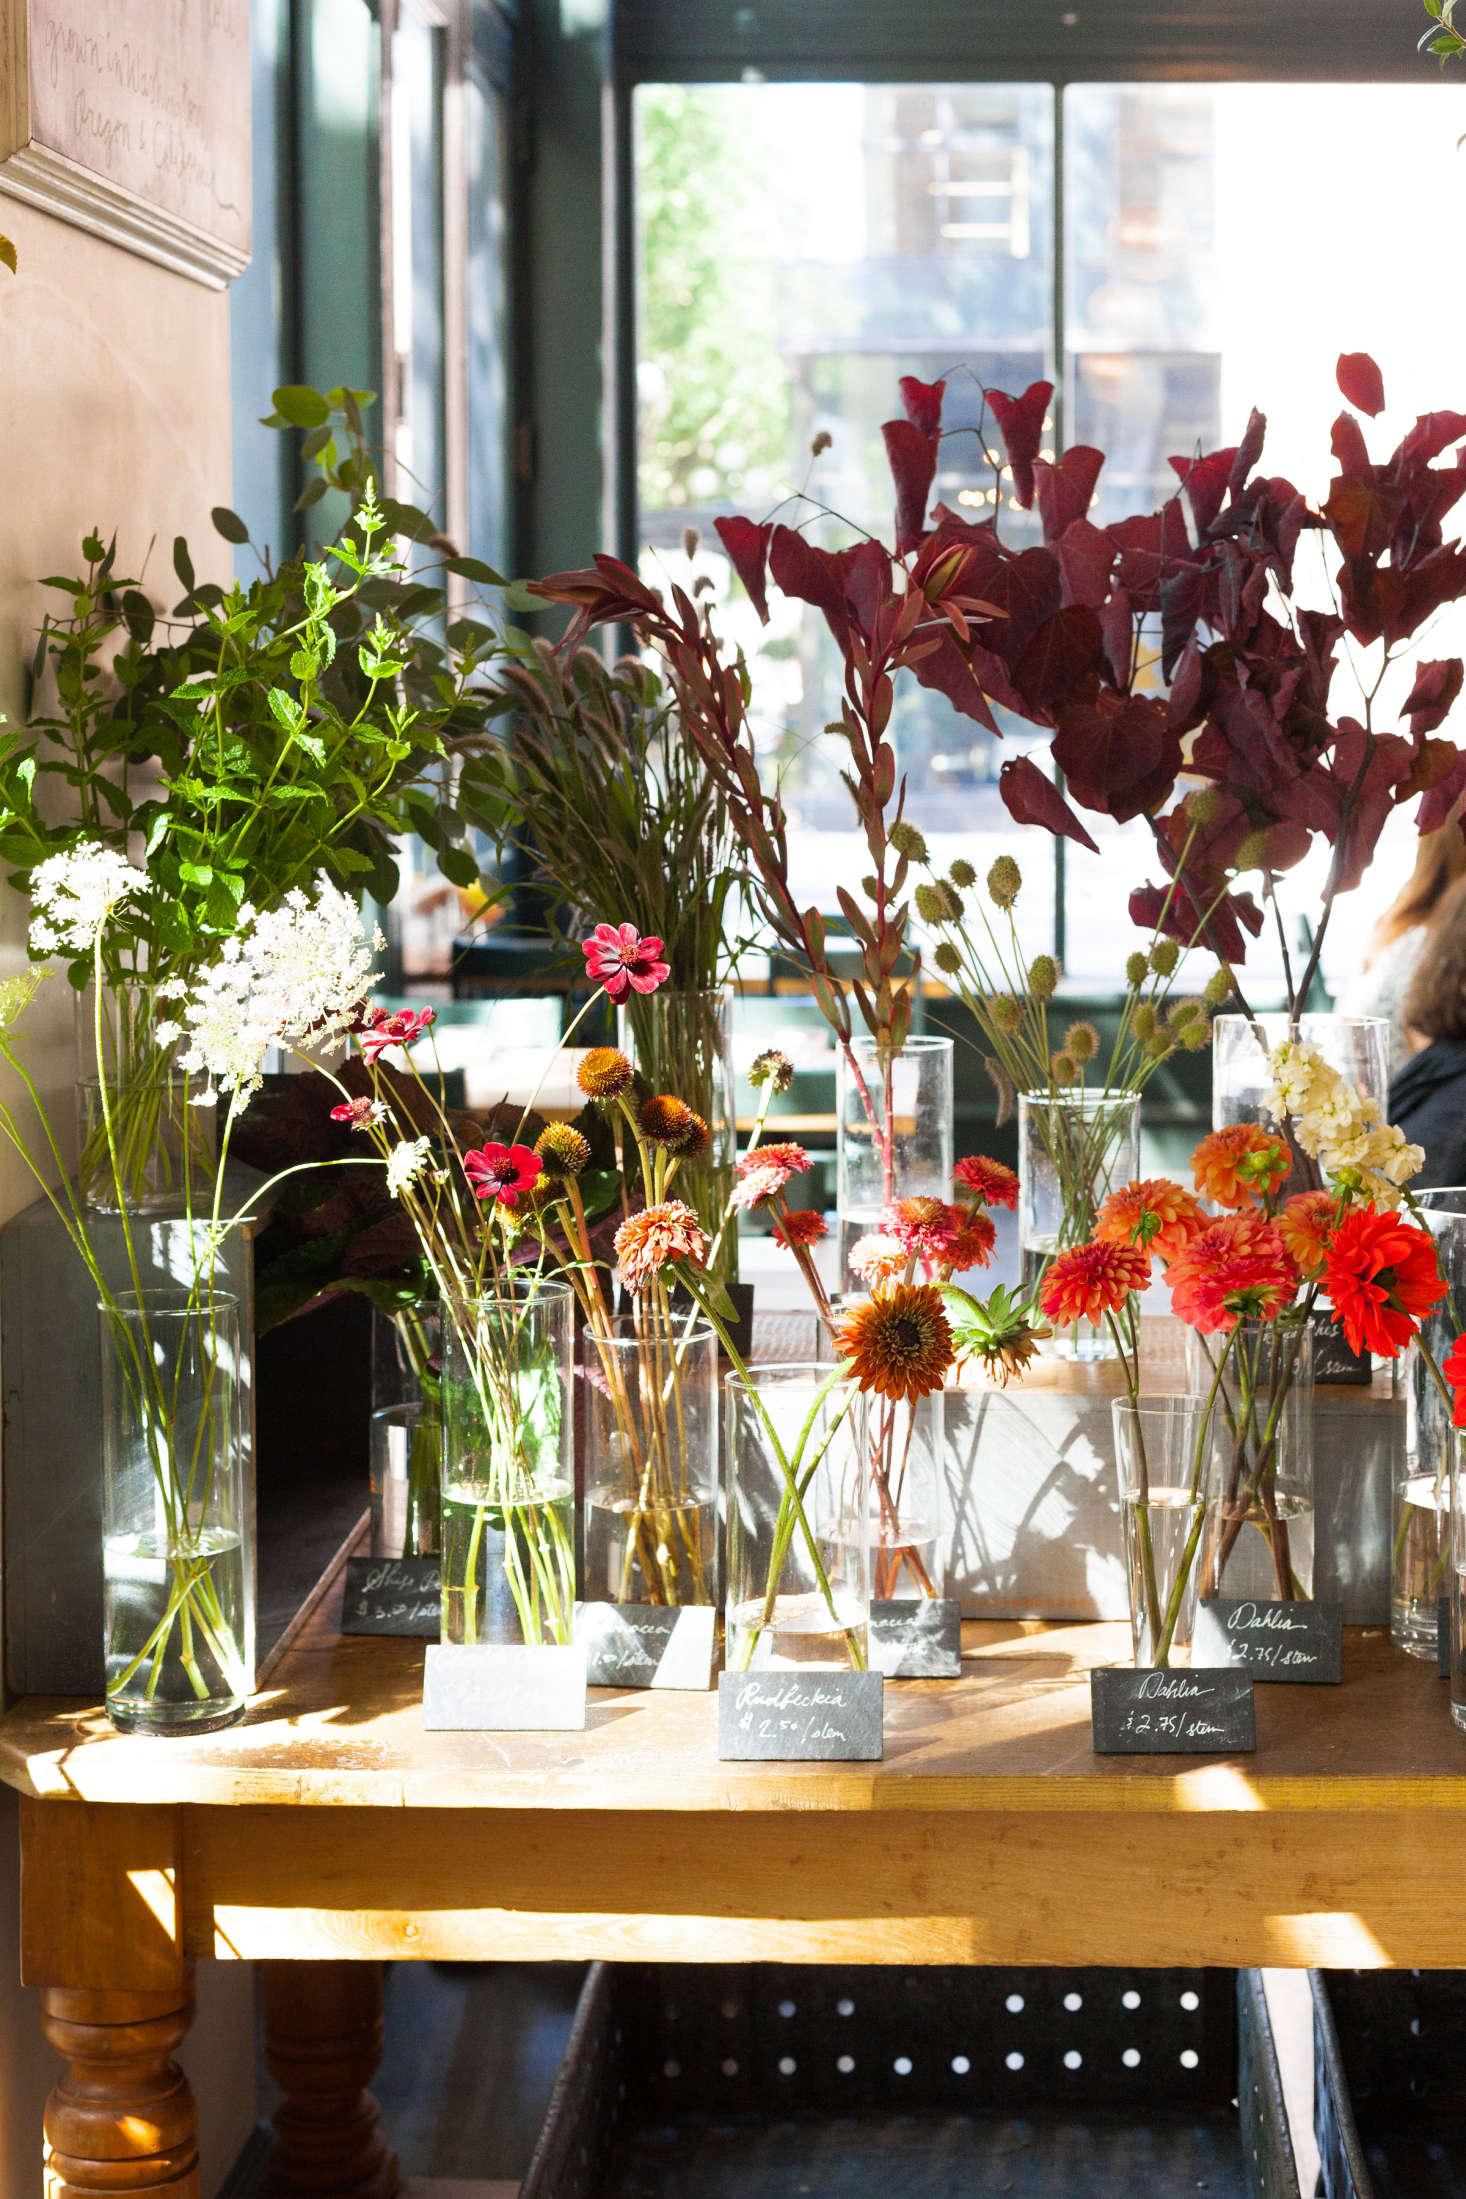 The Flower Shop at Seattles London Plane Gardenista